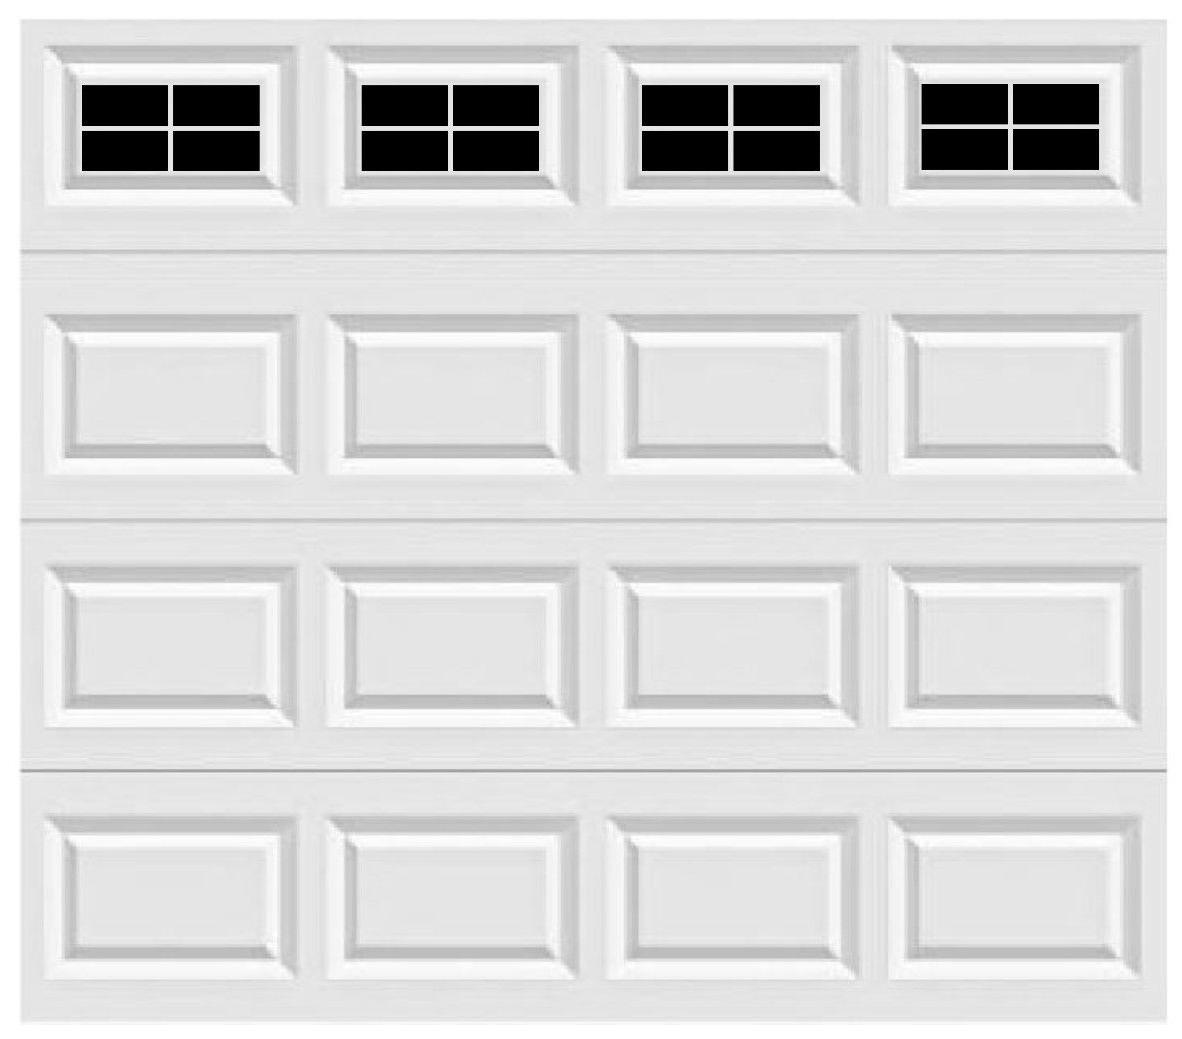 Faux Garage Door Windows Craftsman Style Faux Window Garage Door Vinyl Decals Garage Door